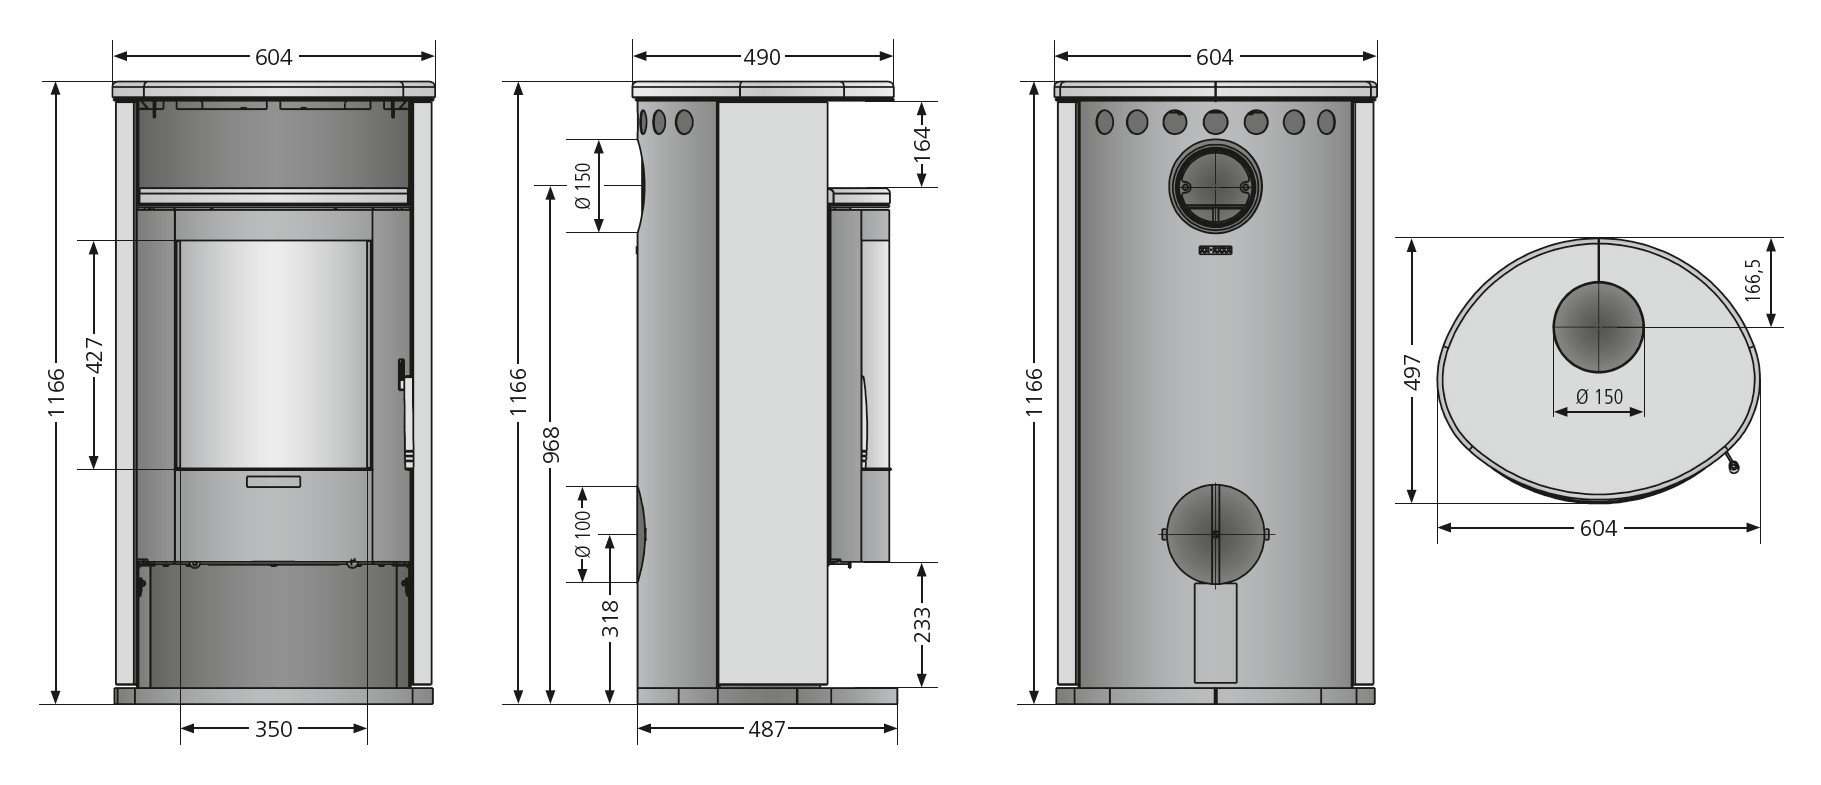 Kaminofen Justus Island 7 raumluftunabhängig Keramik Freddo 6,5kW Bild 2